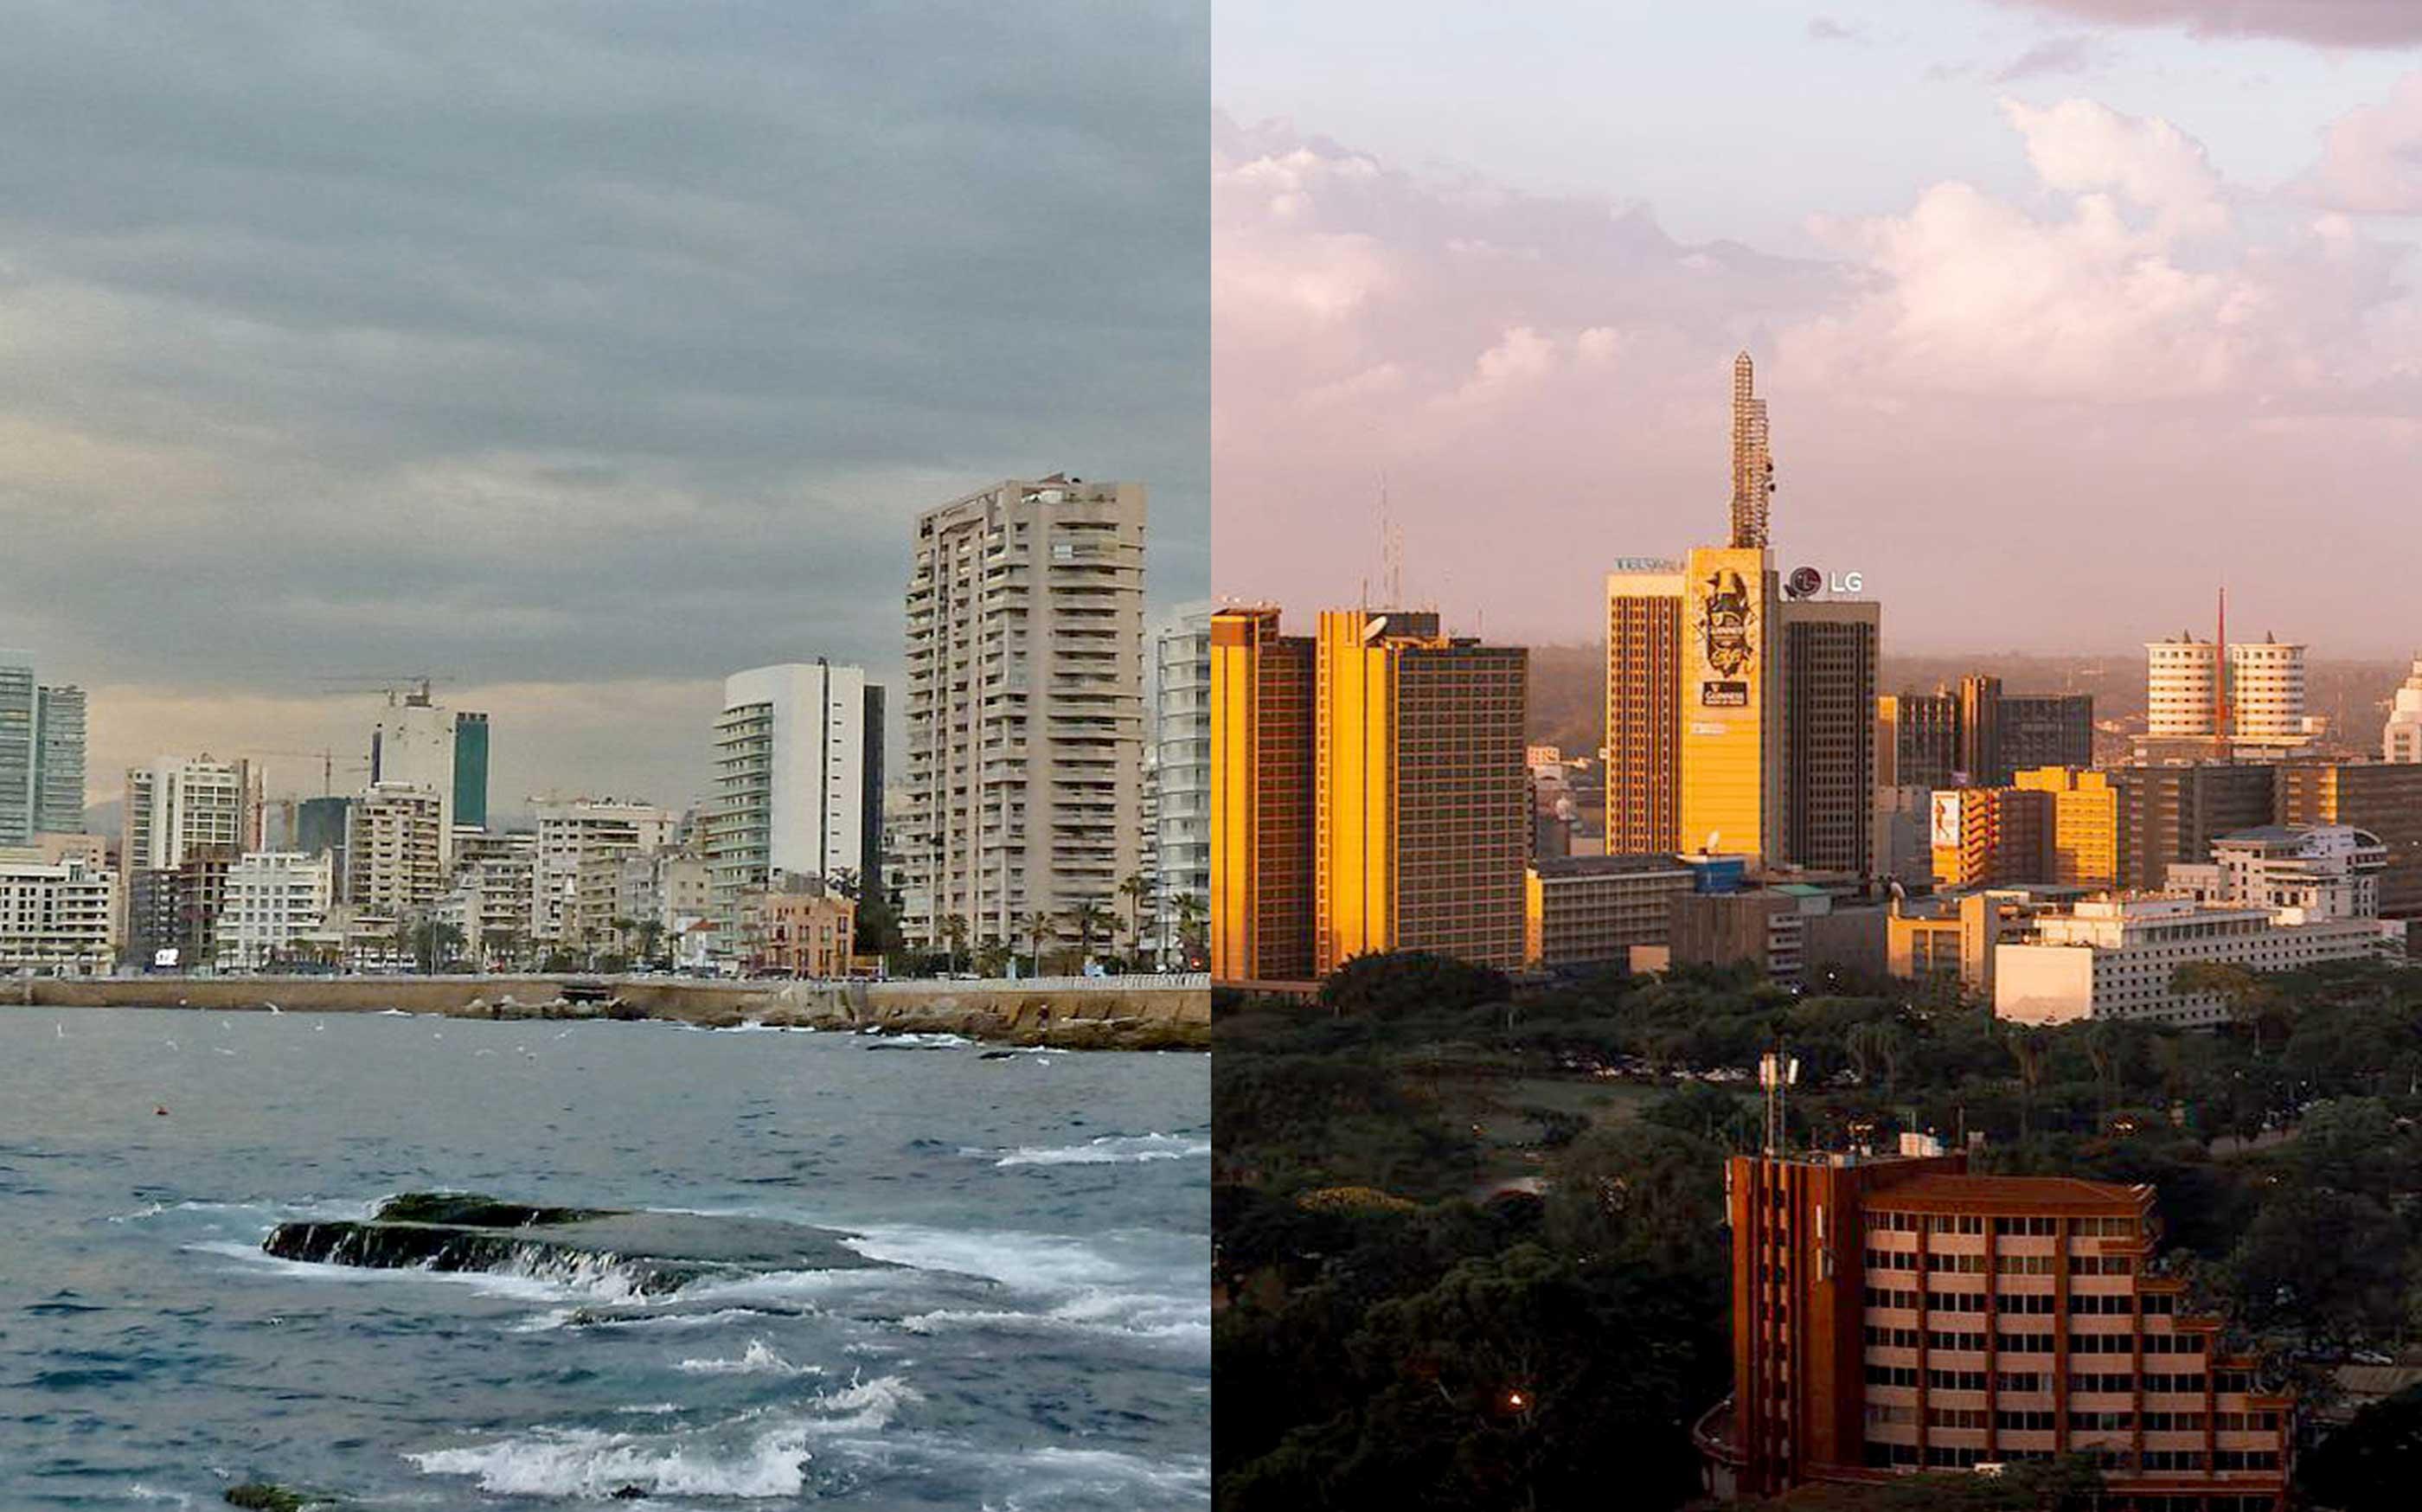 Beirut - Nairobi